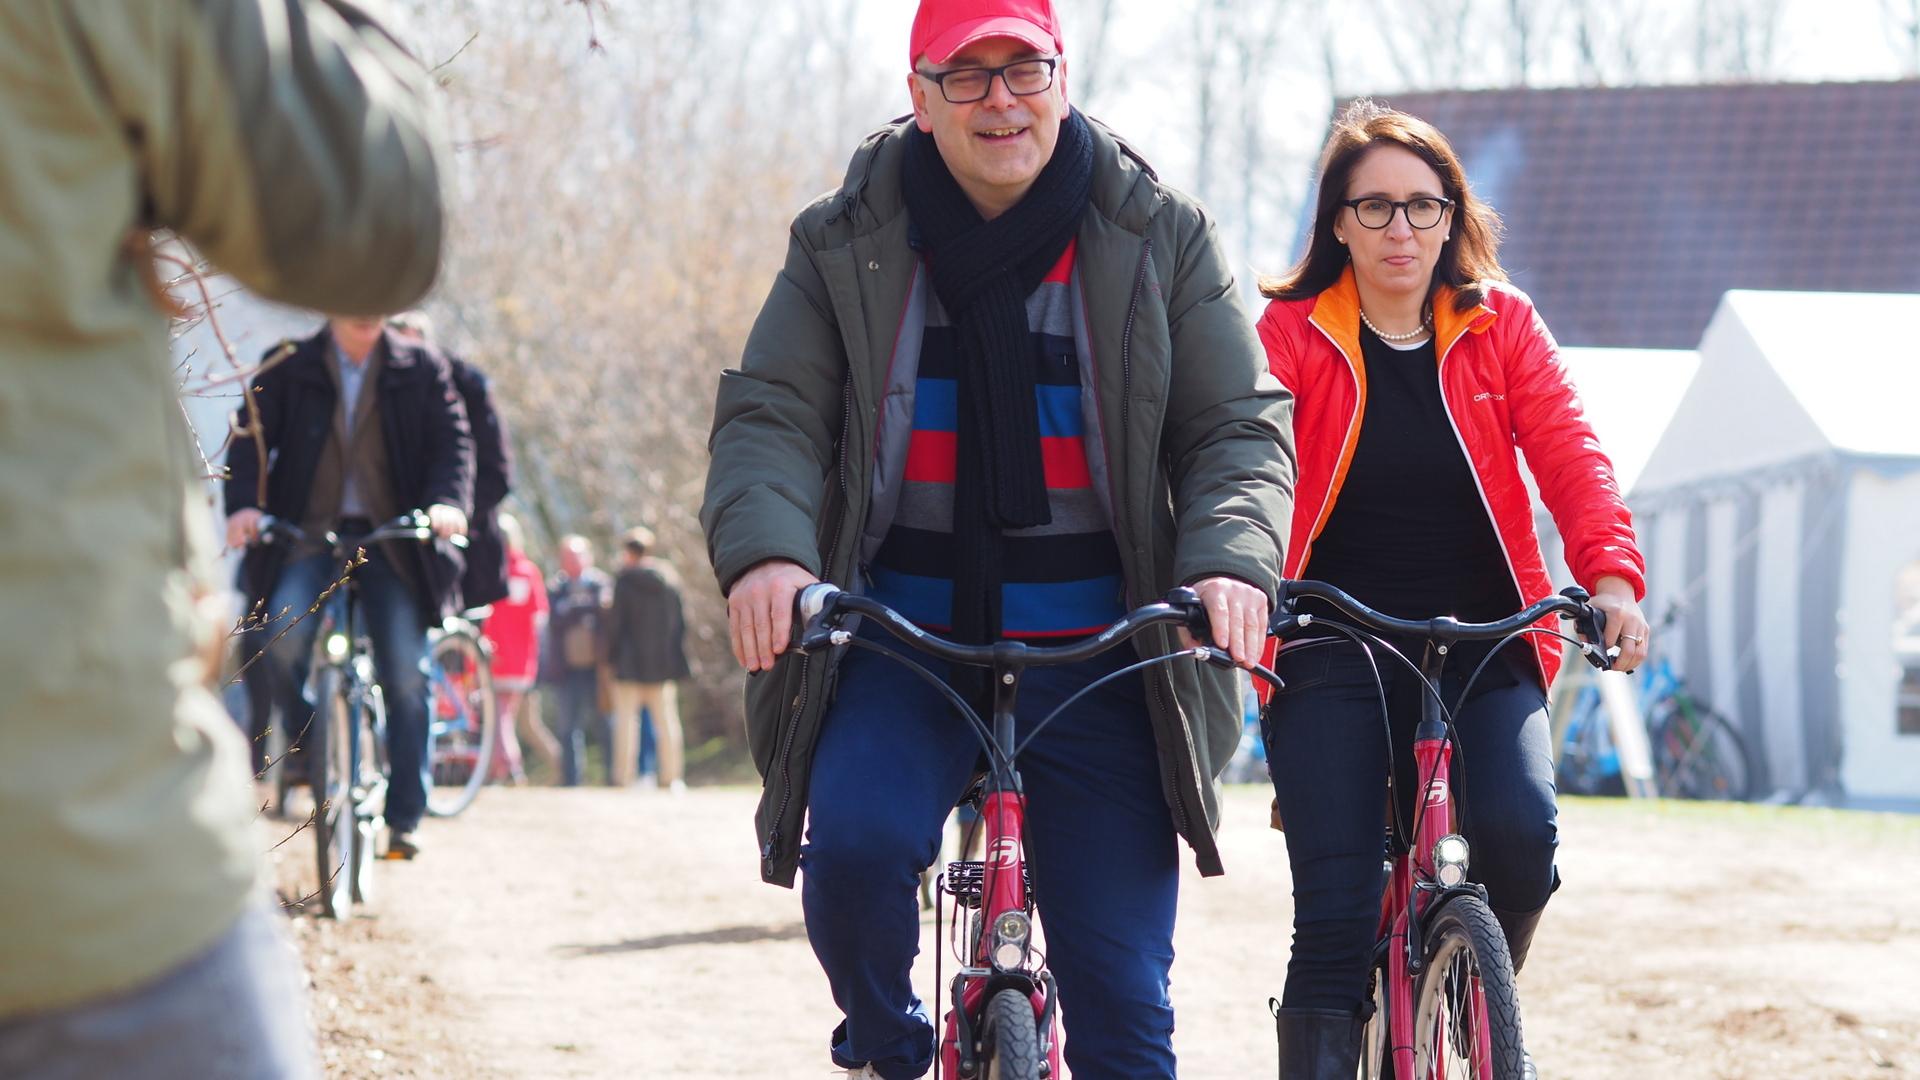 Torsten Albig und Bärbel Boy fahren Rad